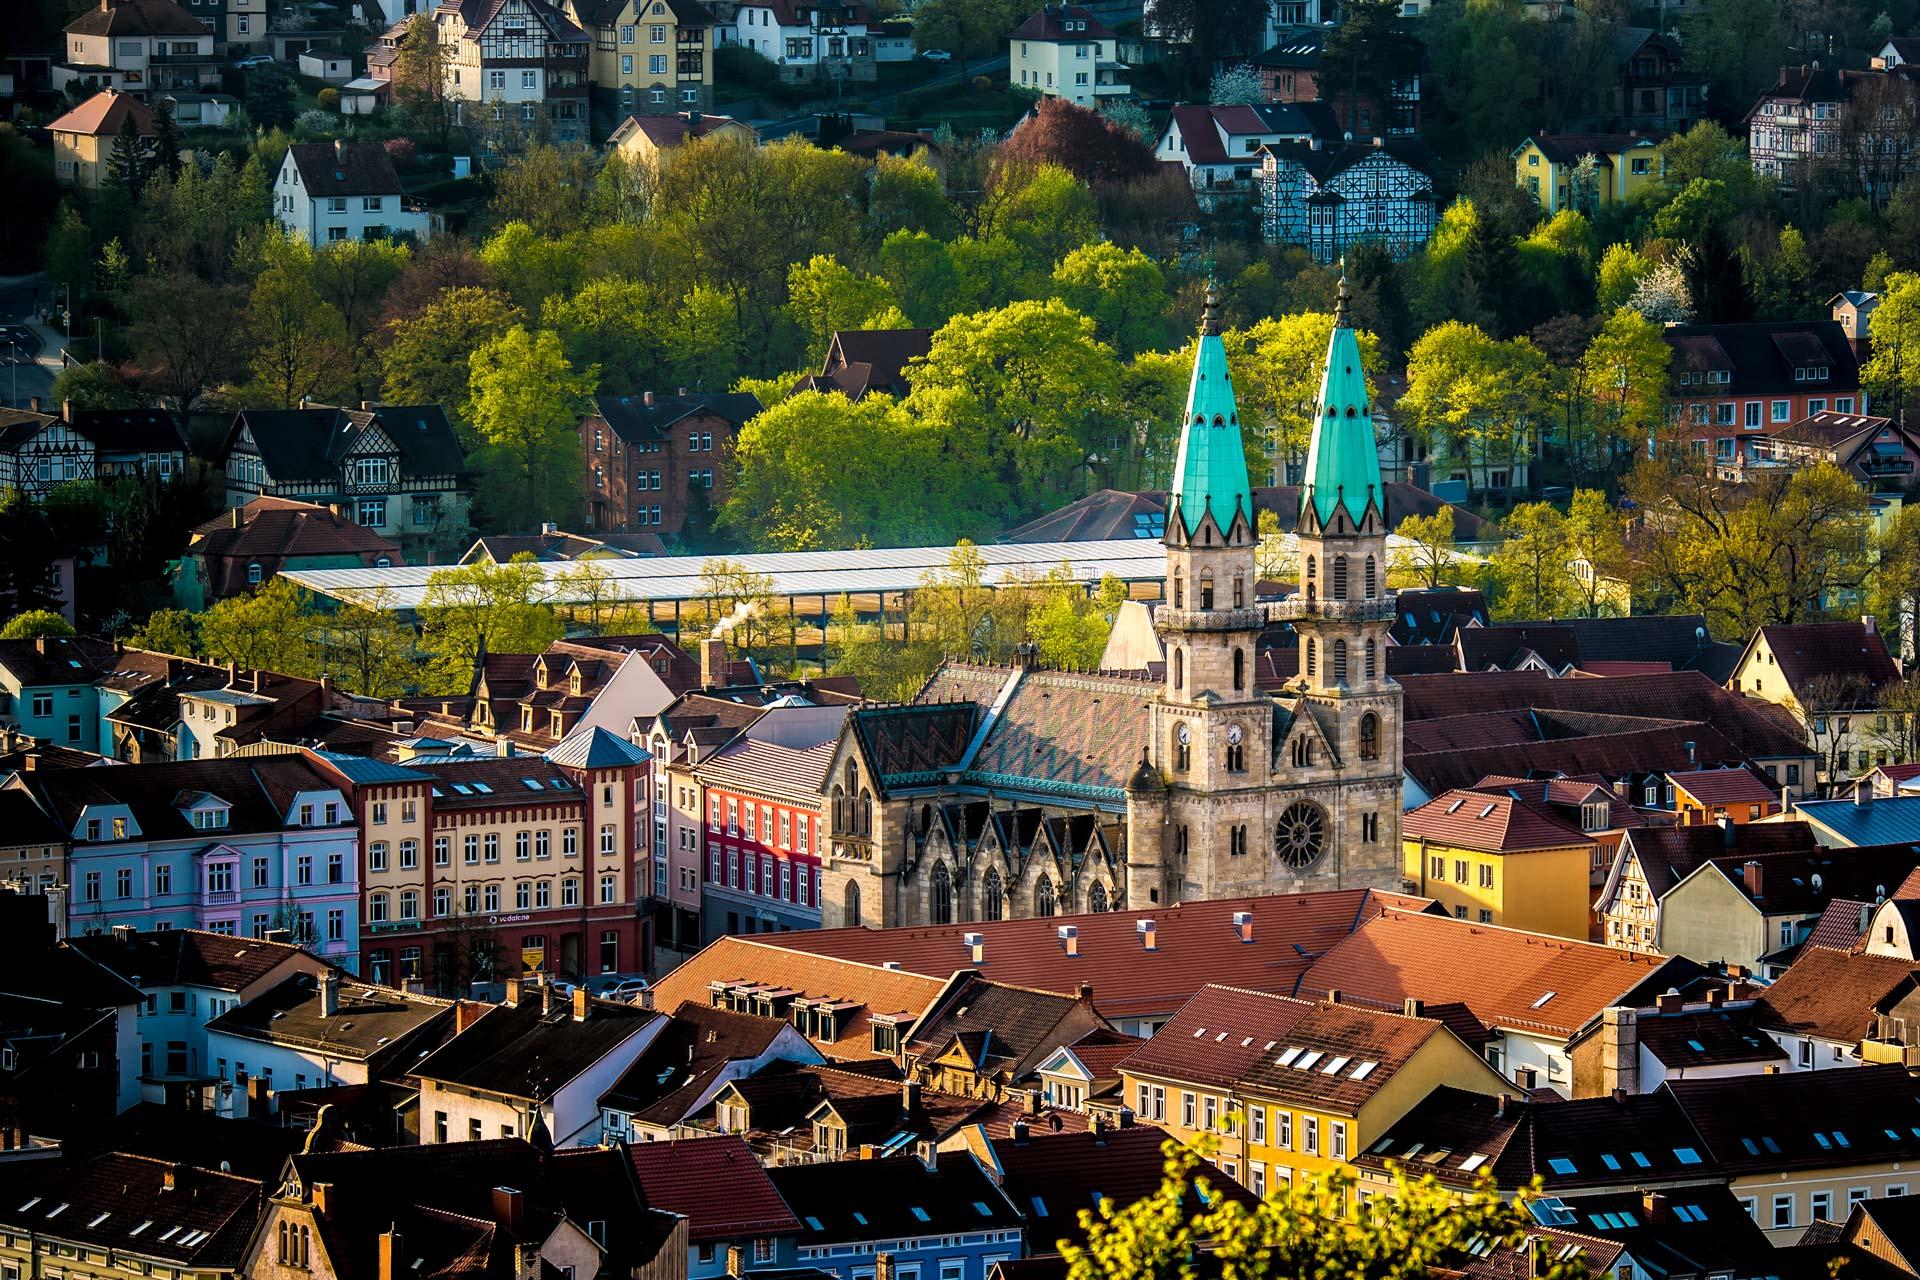 Landschaftsfotografie - Kirche Meiningen